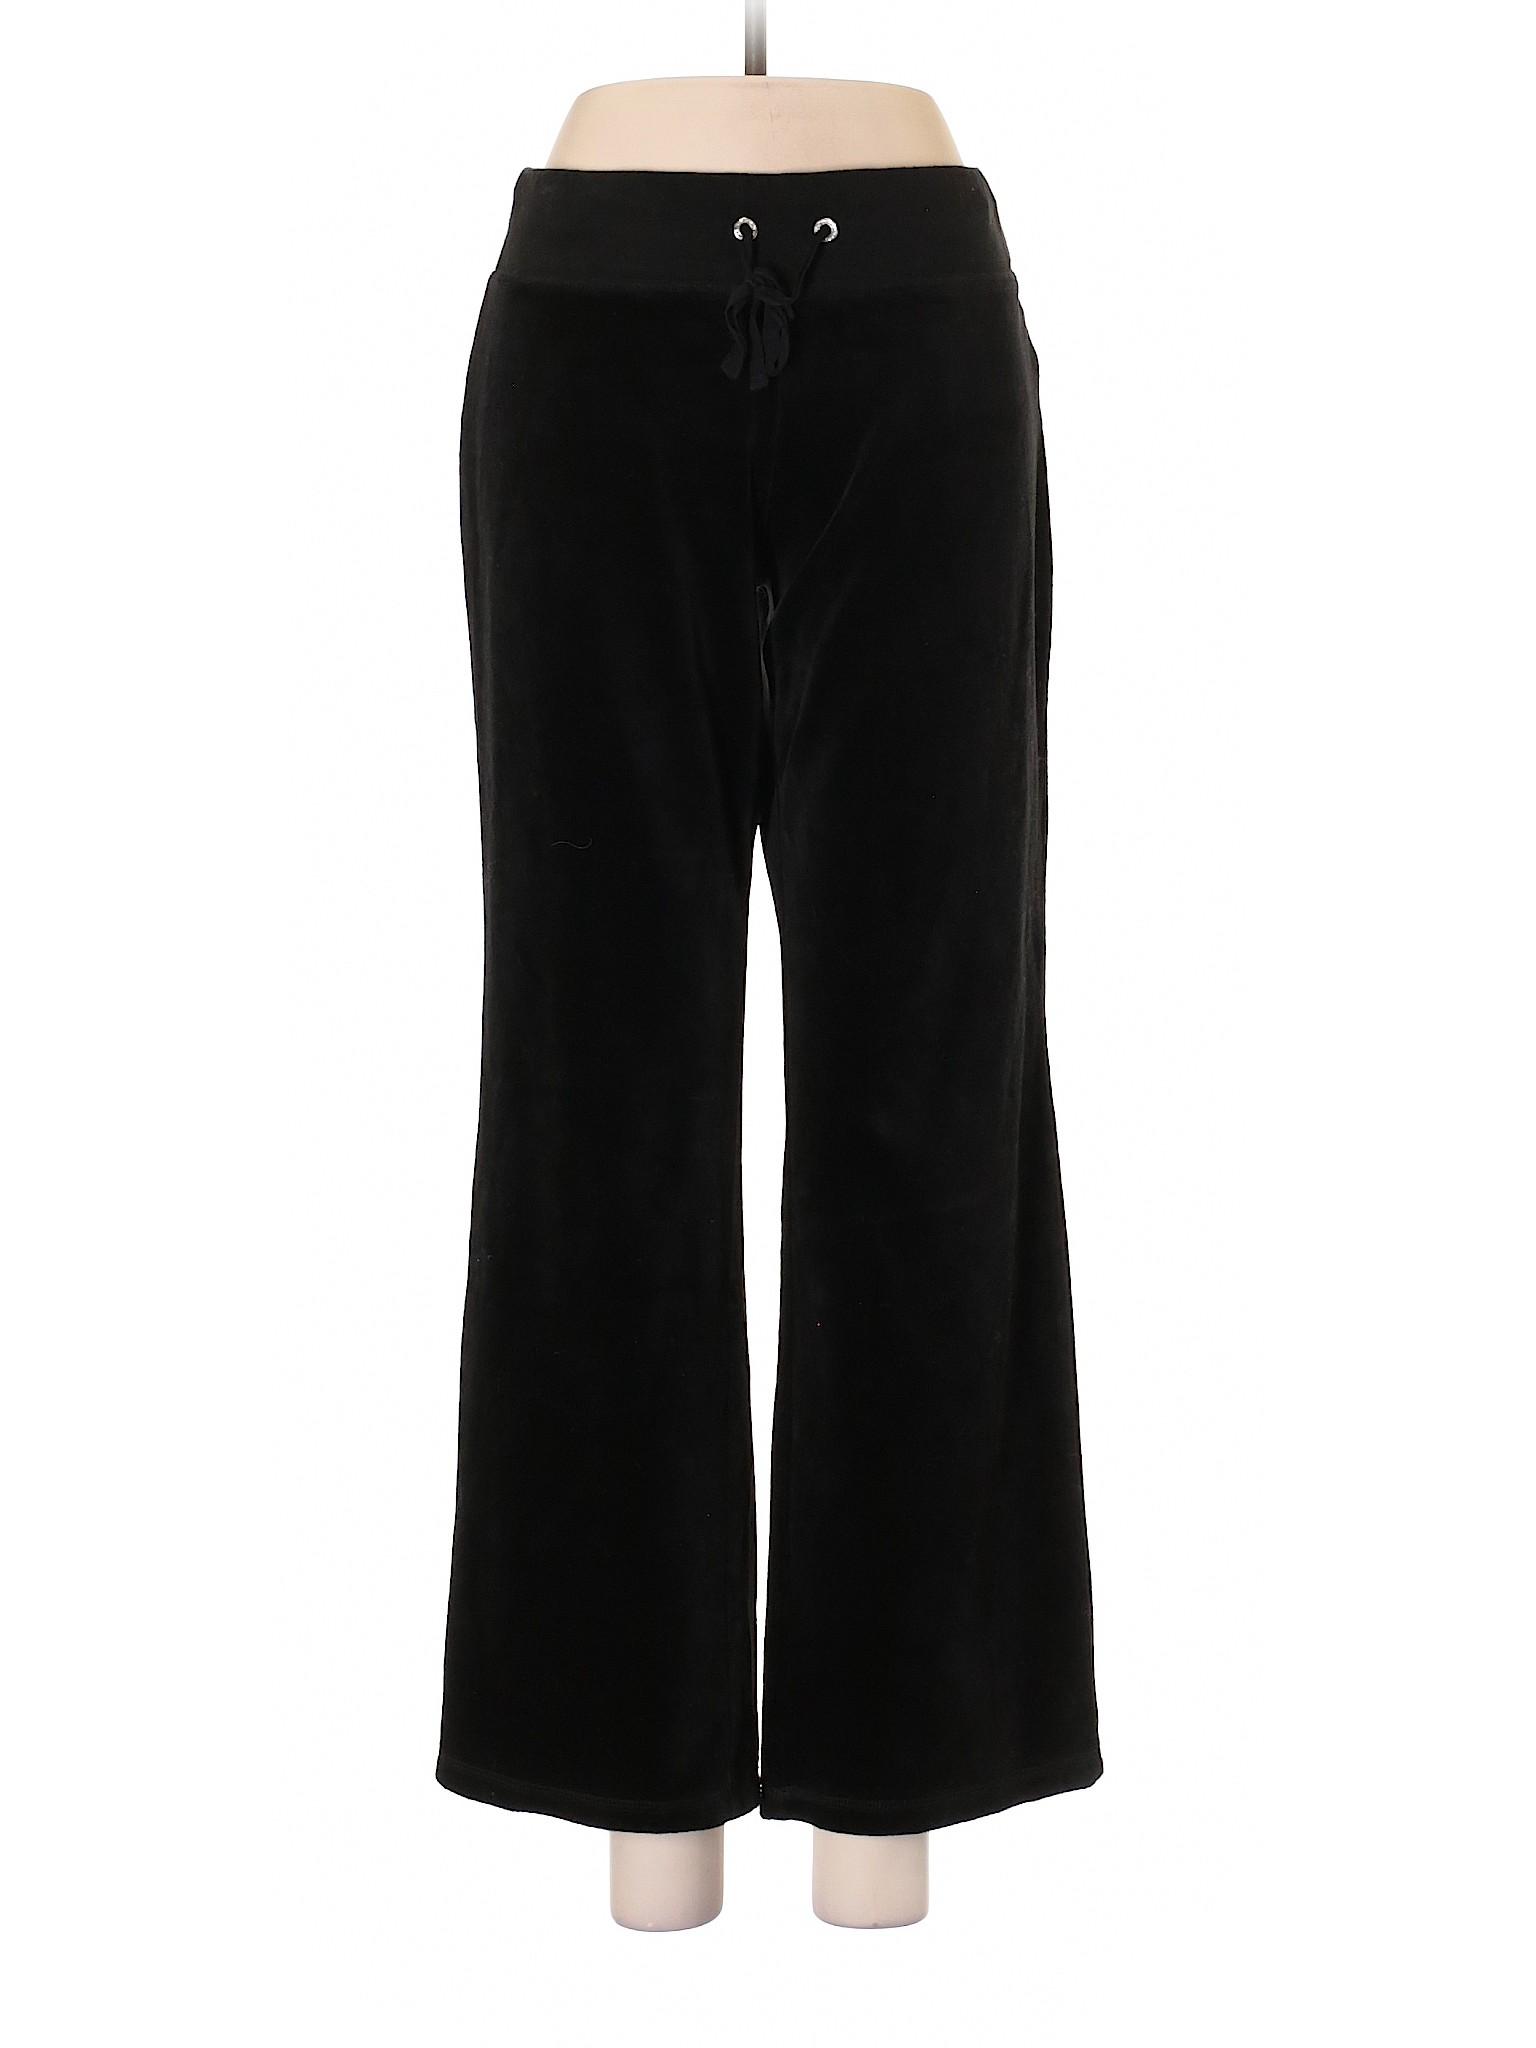 Sweatpants winter Company New Boutique York amp; Aw064cqnB